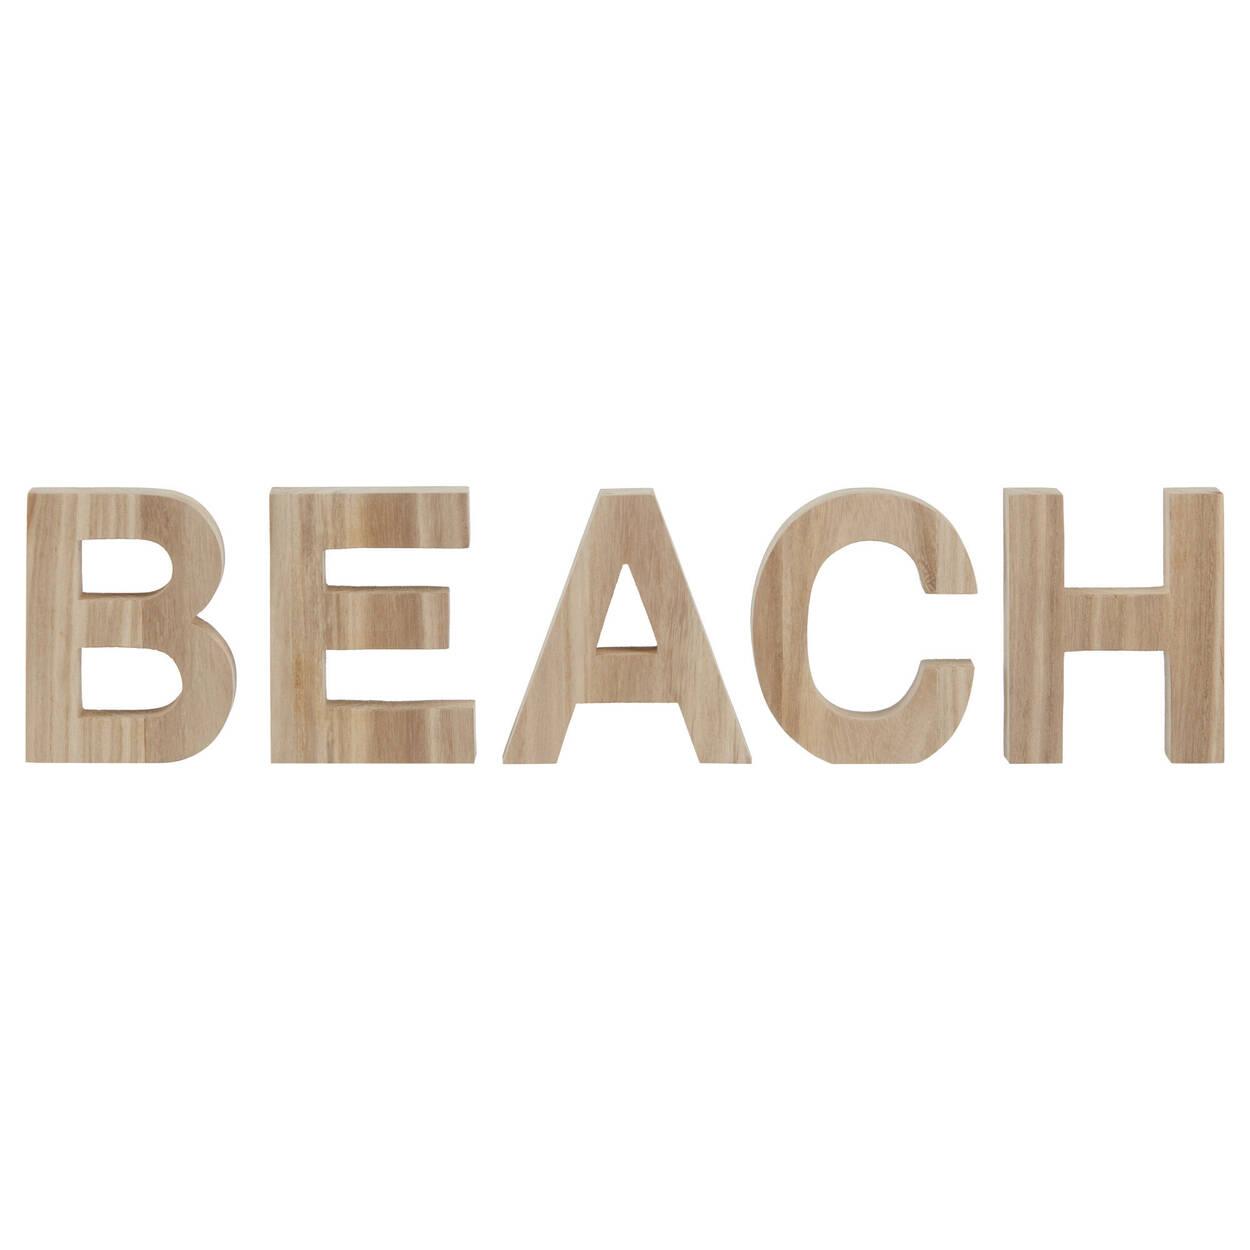 Mot décoratif Beach en bois